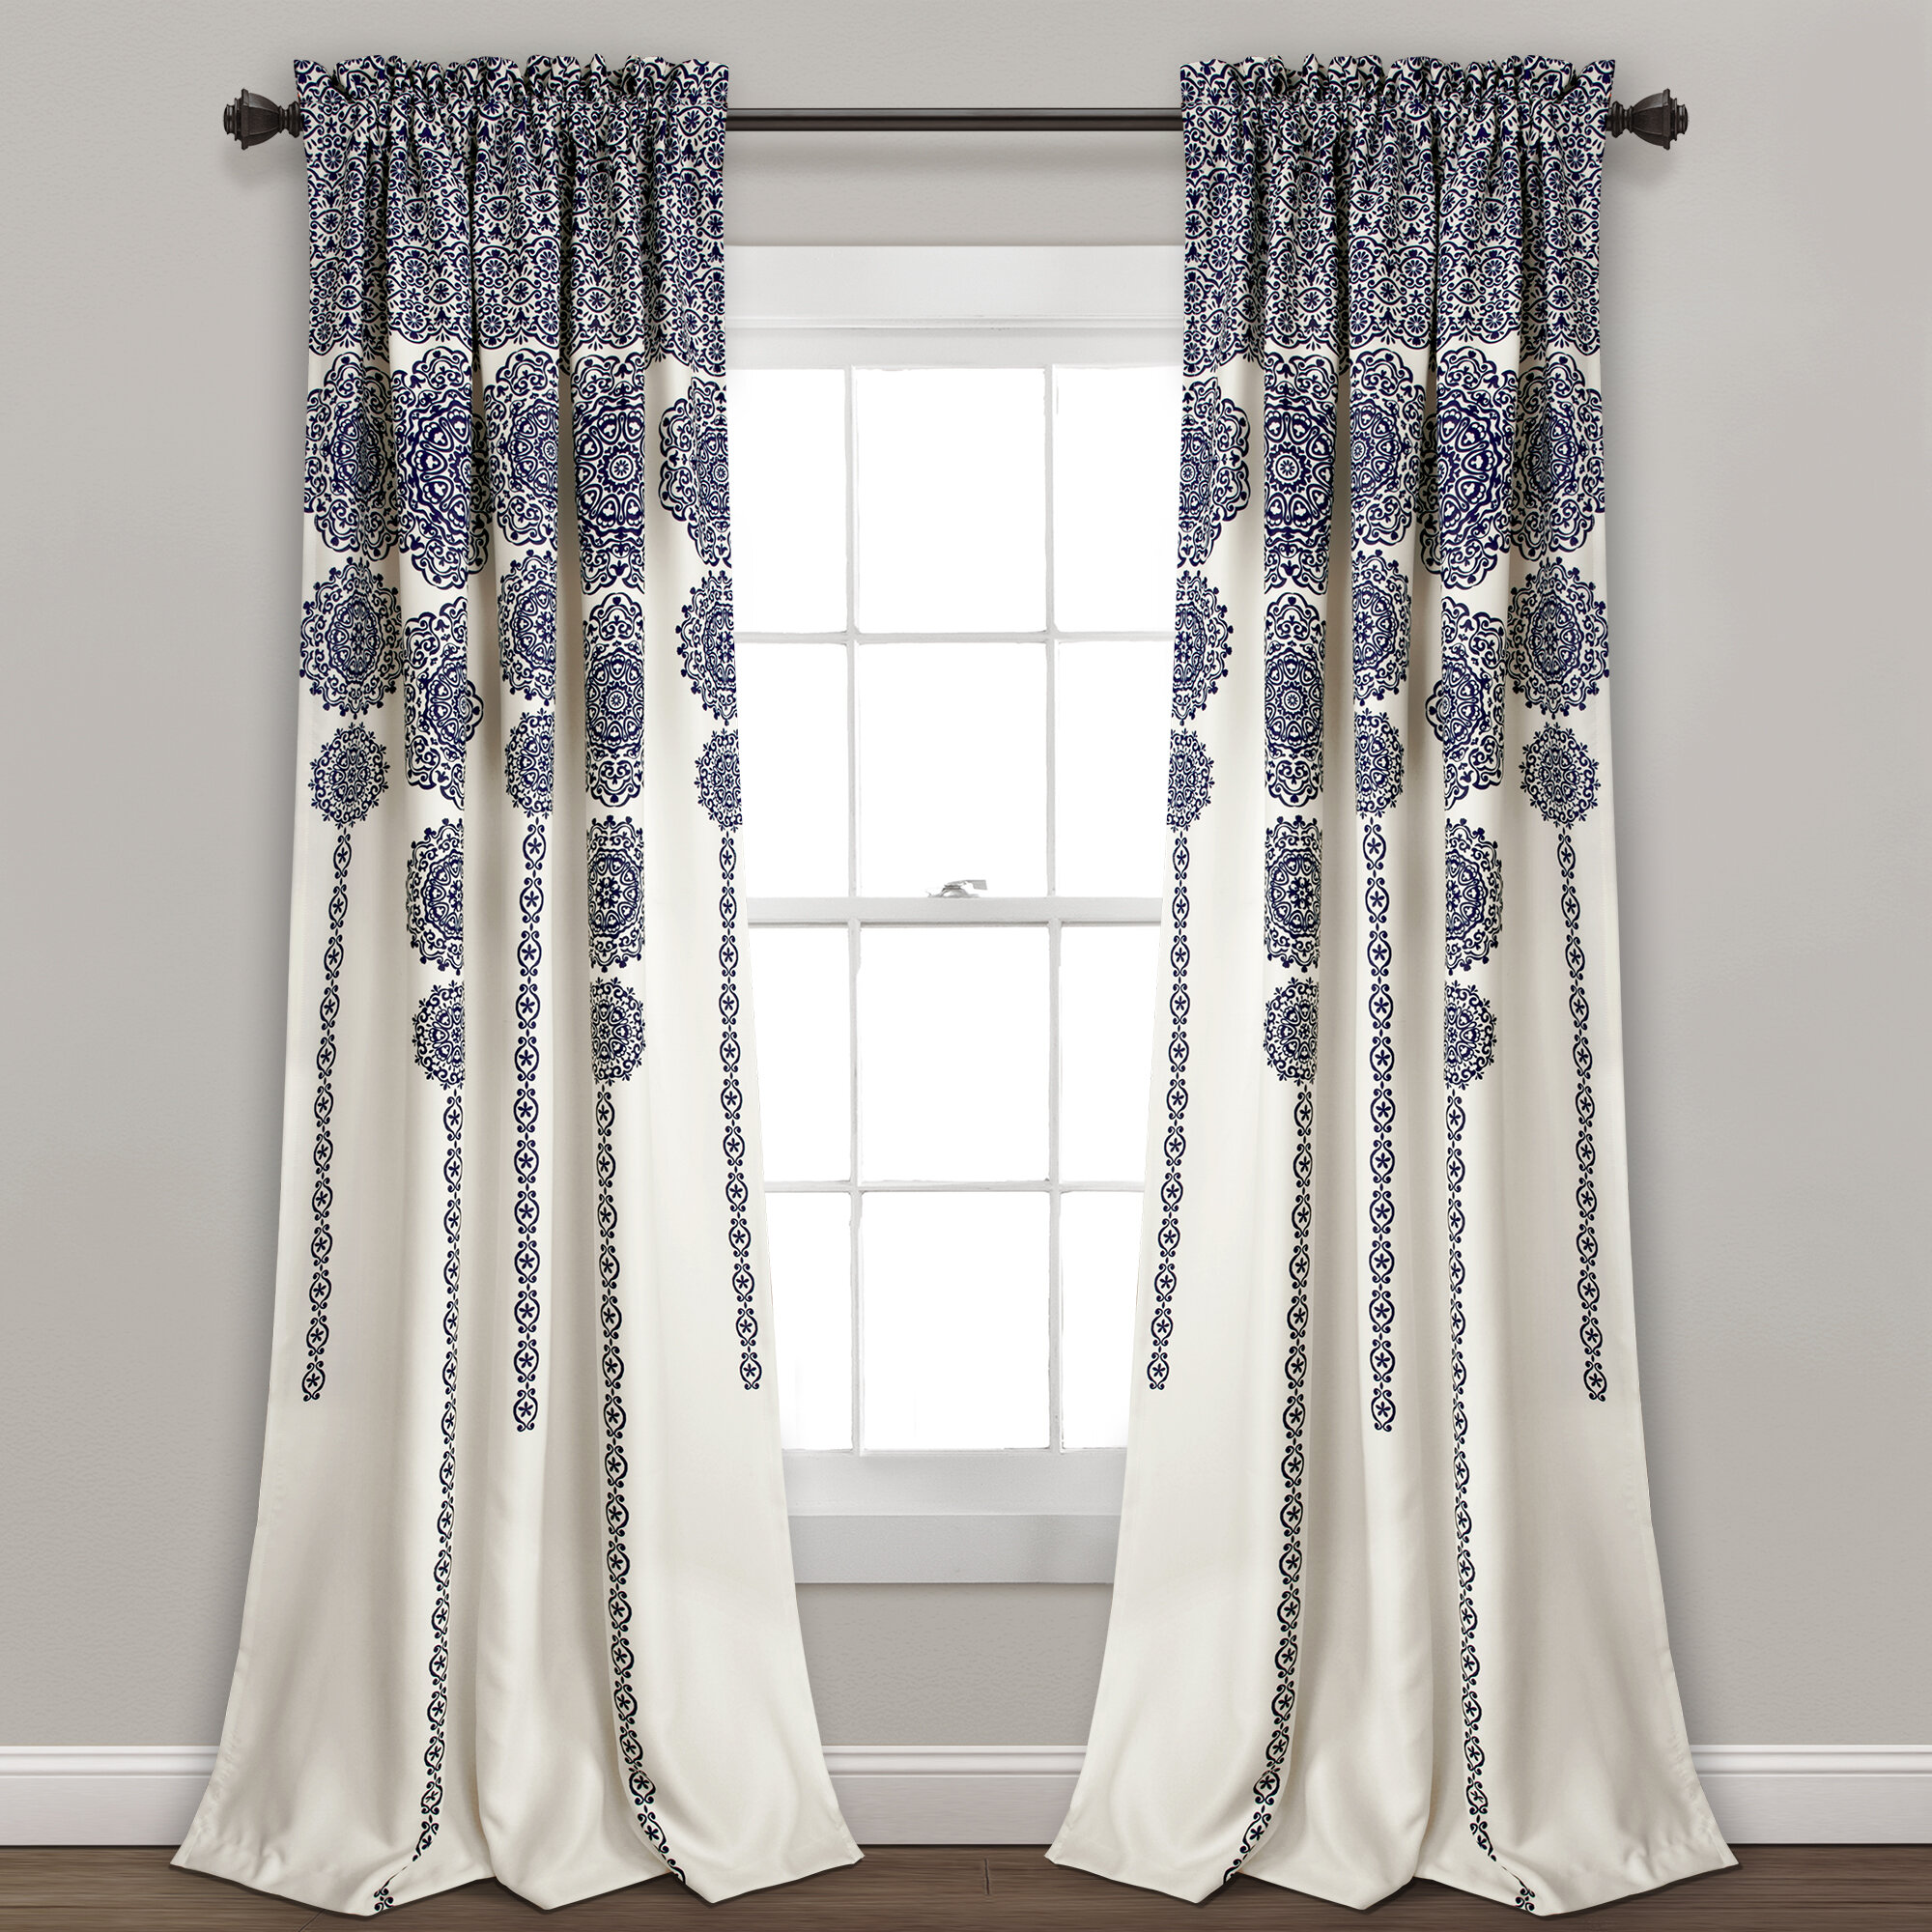 Bungalow Rose Bremond Room Darkening Thermal Rod Pocket Curtain Panels Reviews Wayfair